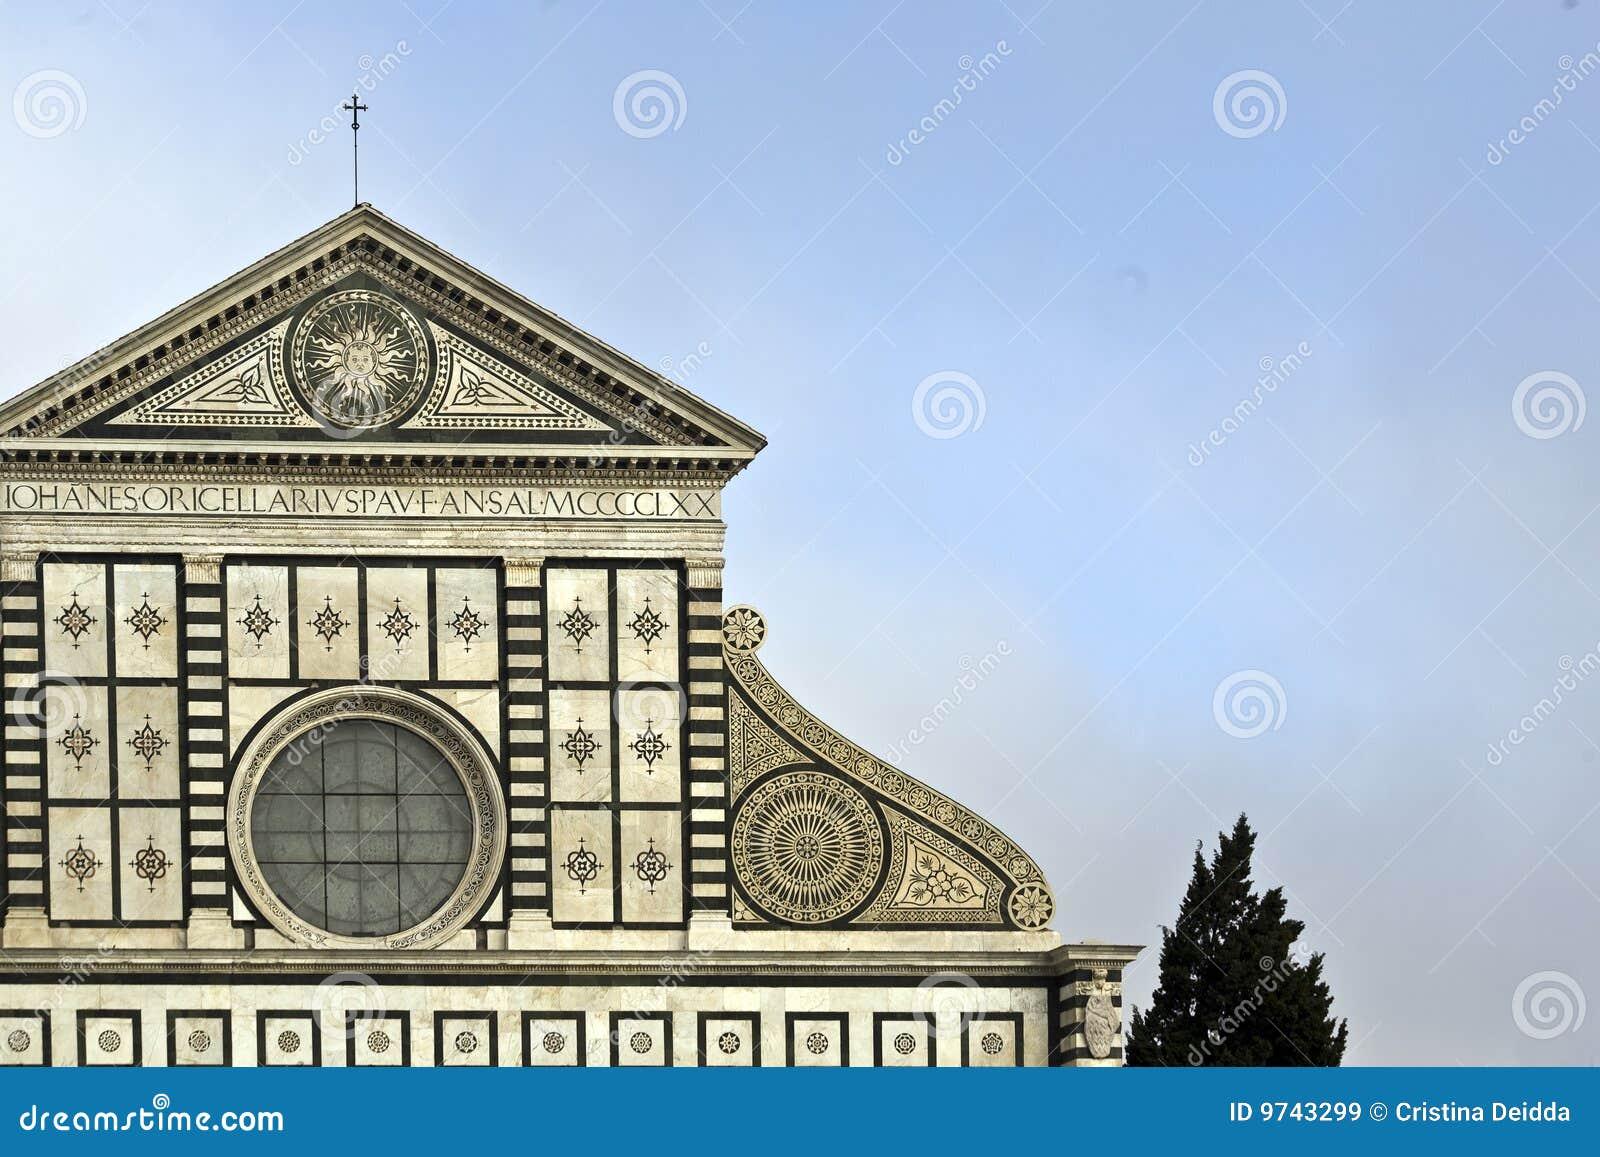 The church of S. Maria Novella